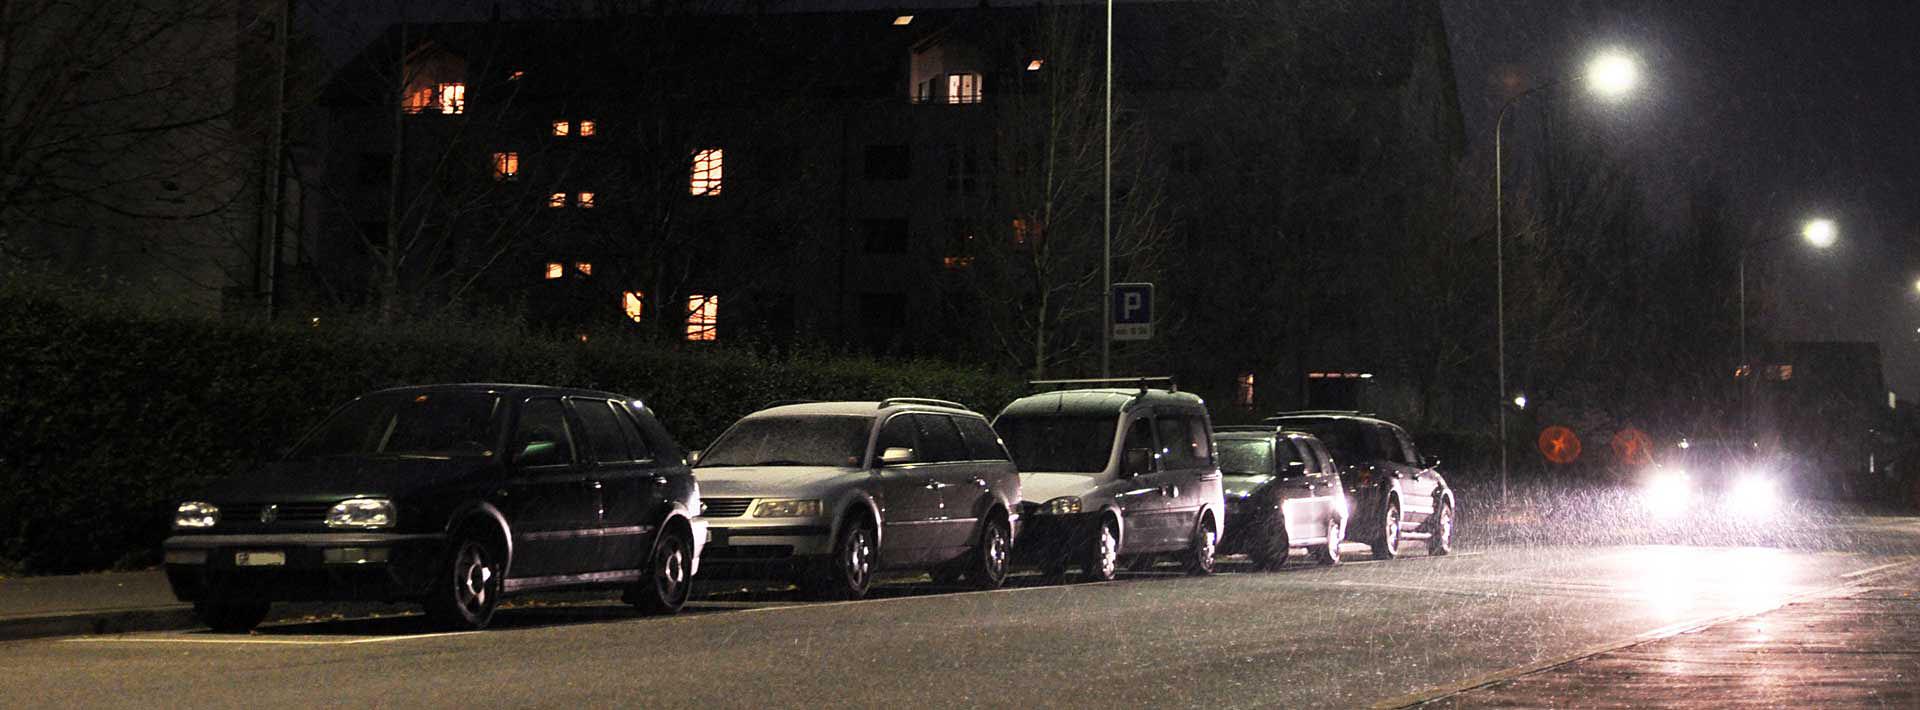 Dauerparkieren